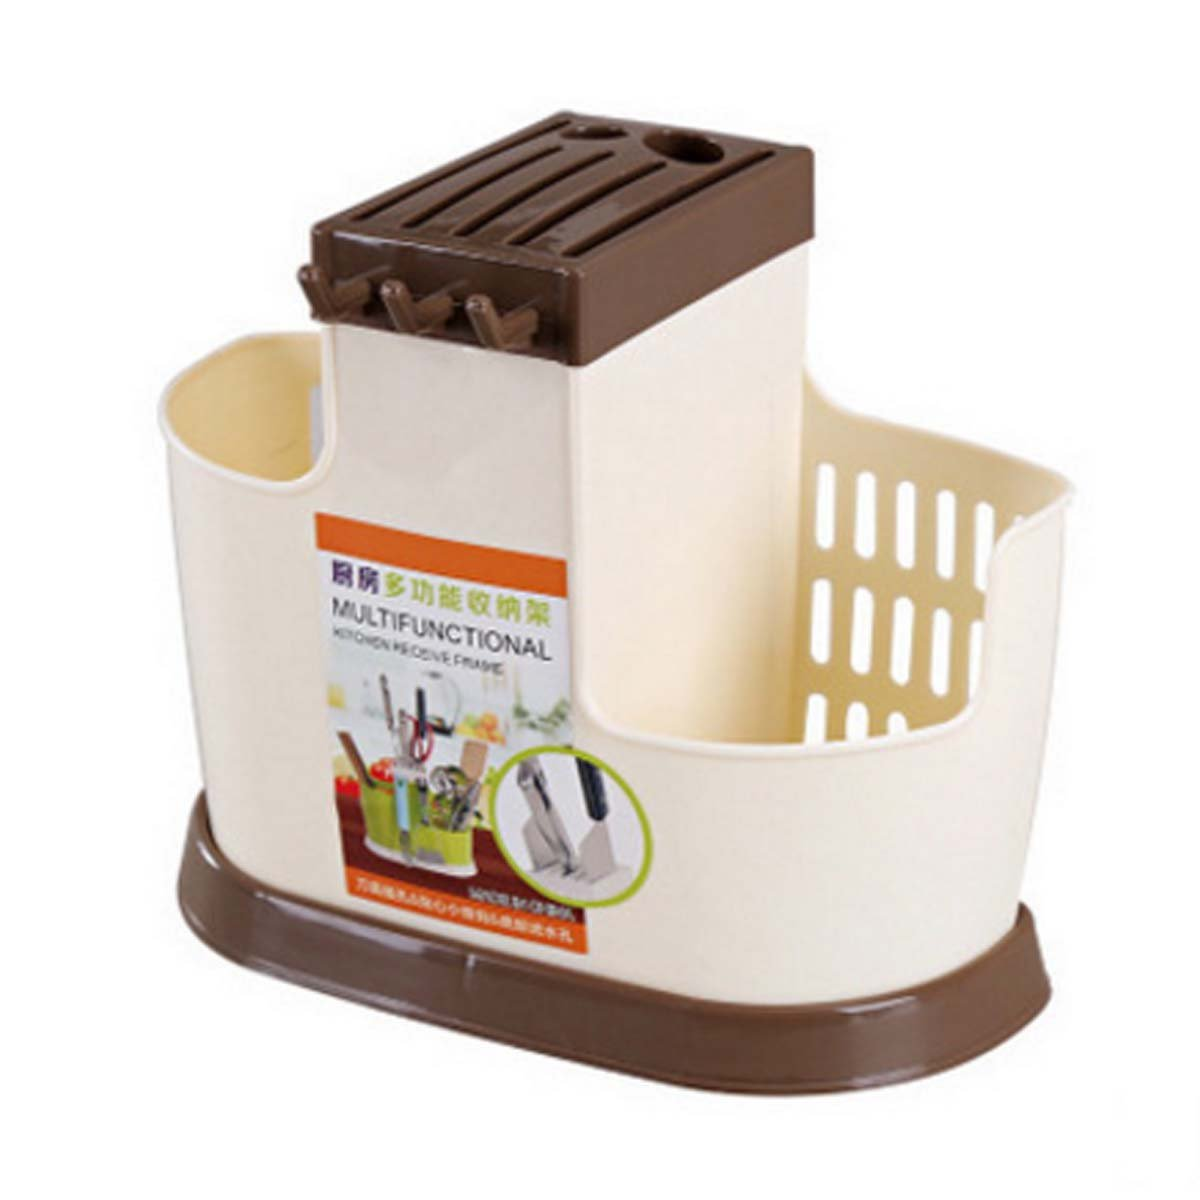 Amazon.de: Kreative Essstäbchenhalter Halter Rack Stand Küchengerät ...